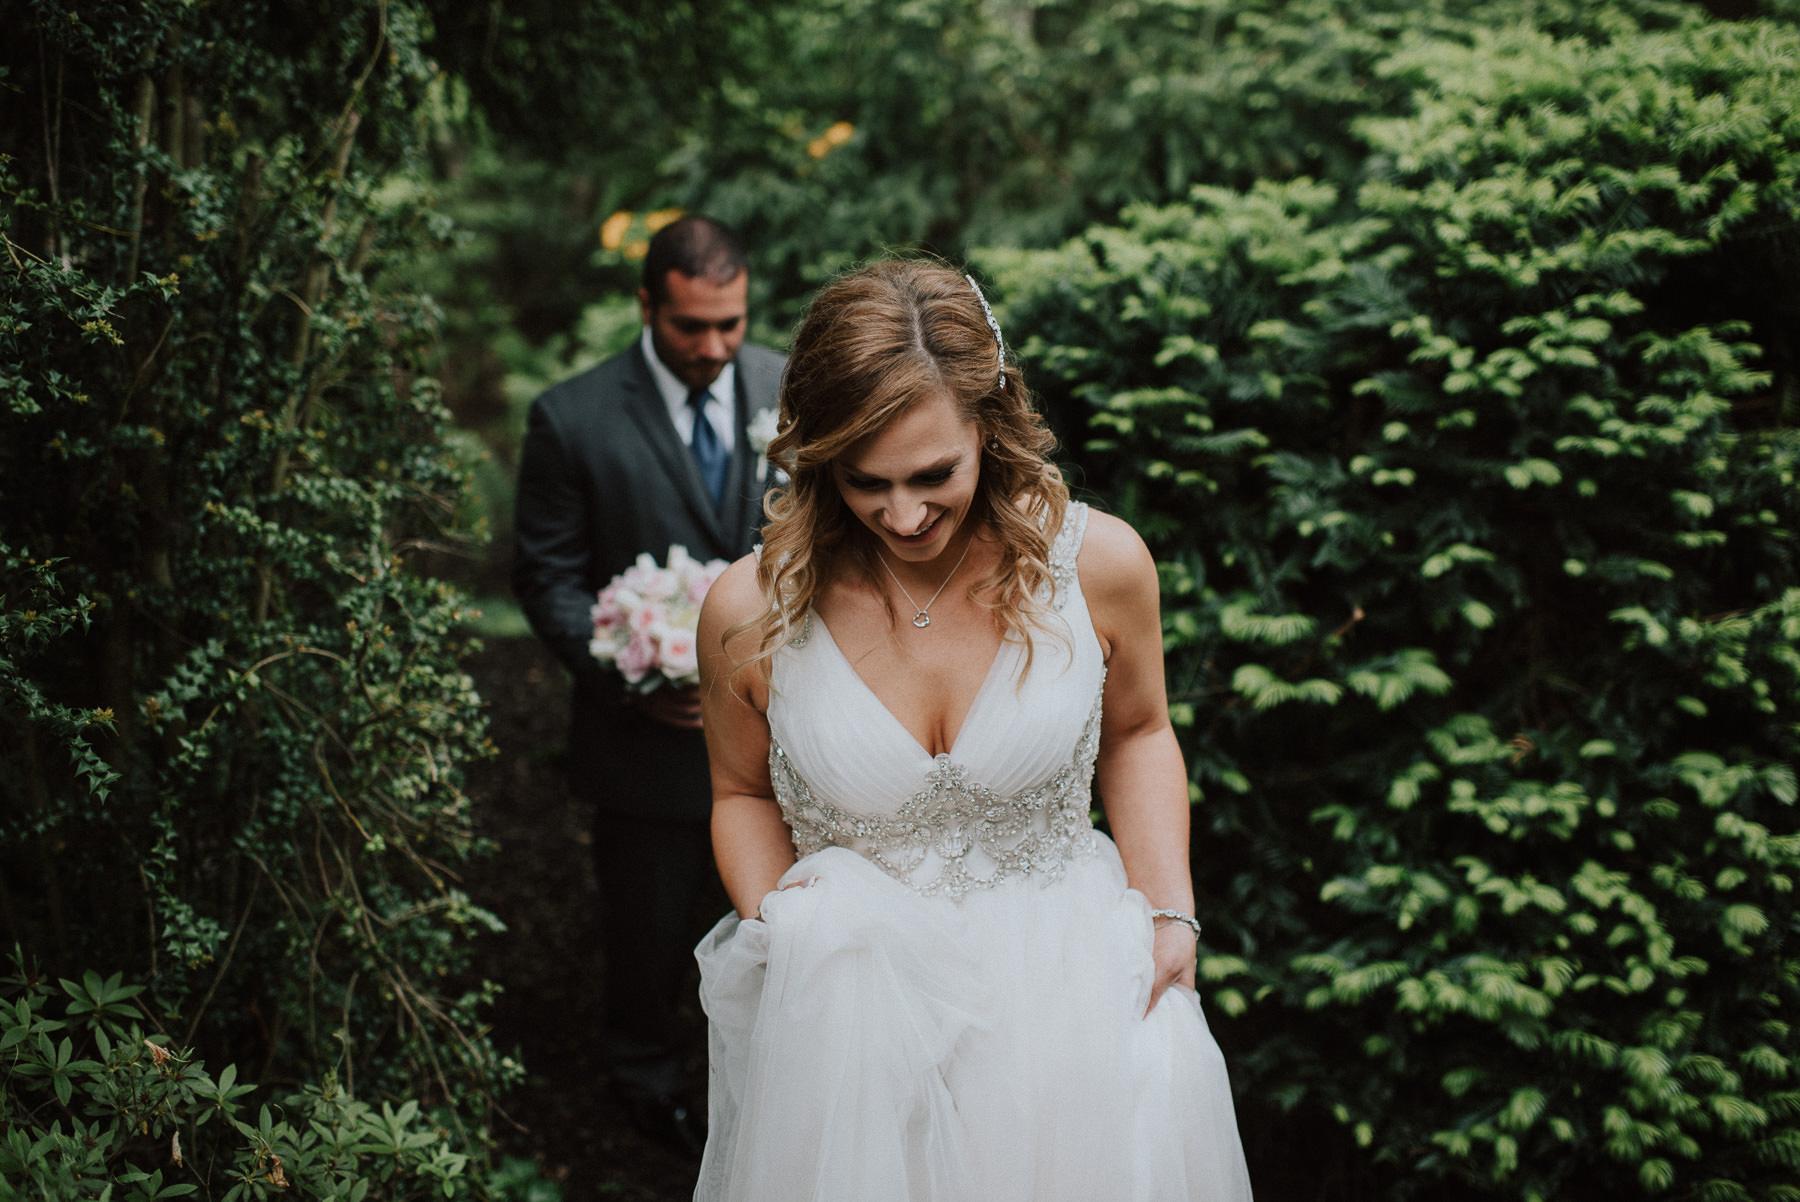 appleford-estate-wedding-photography-39.jpg